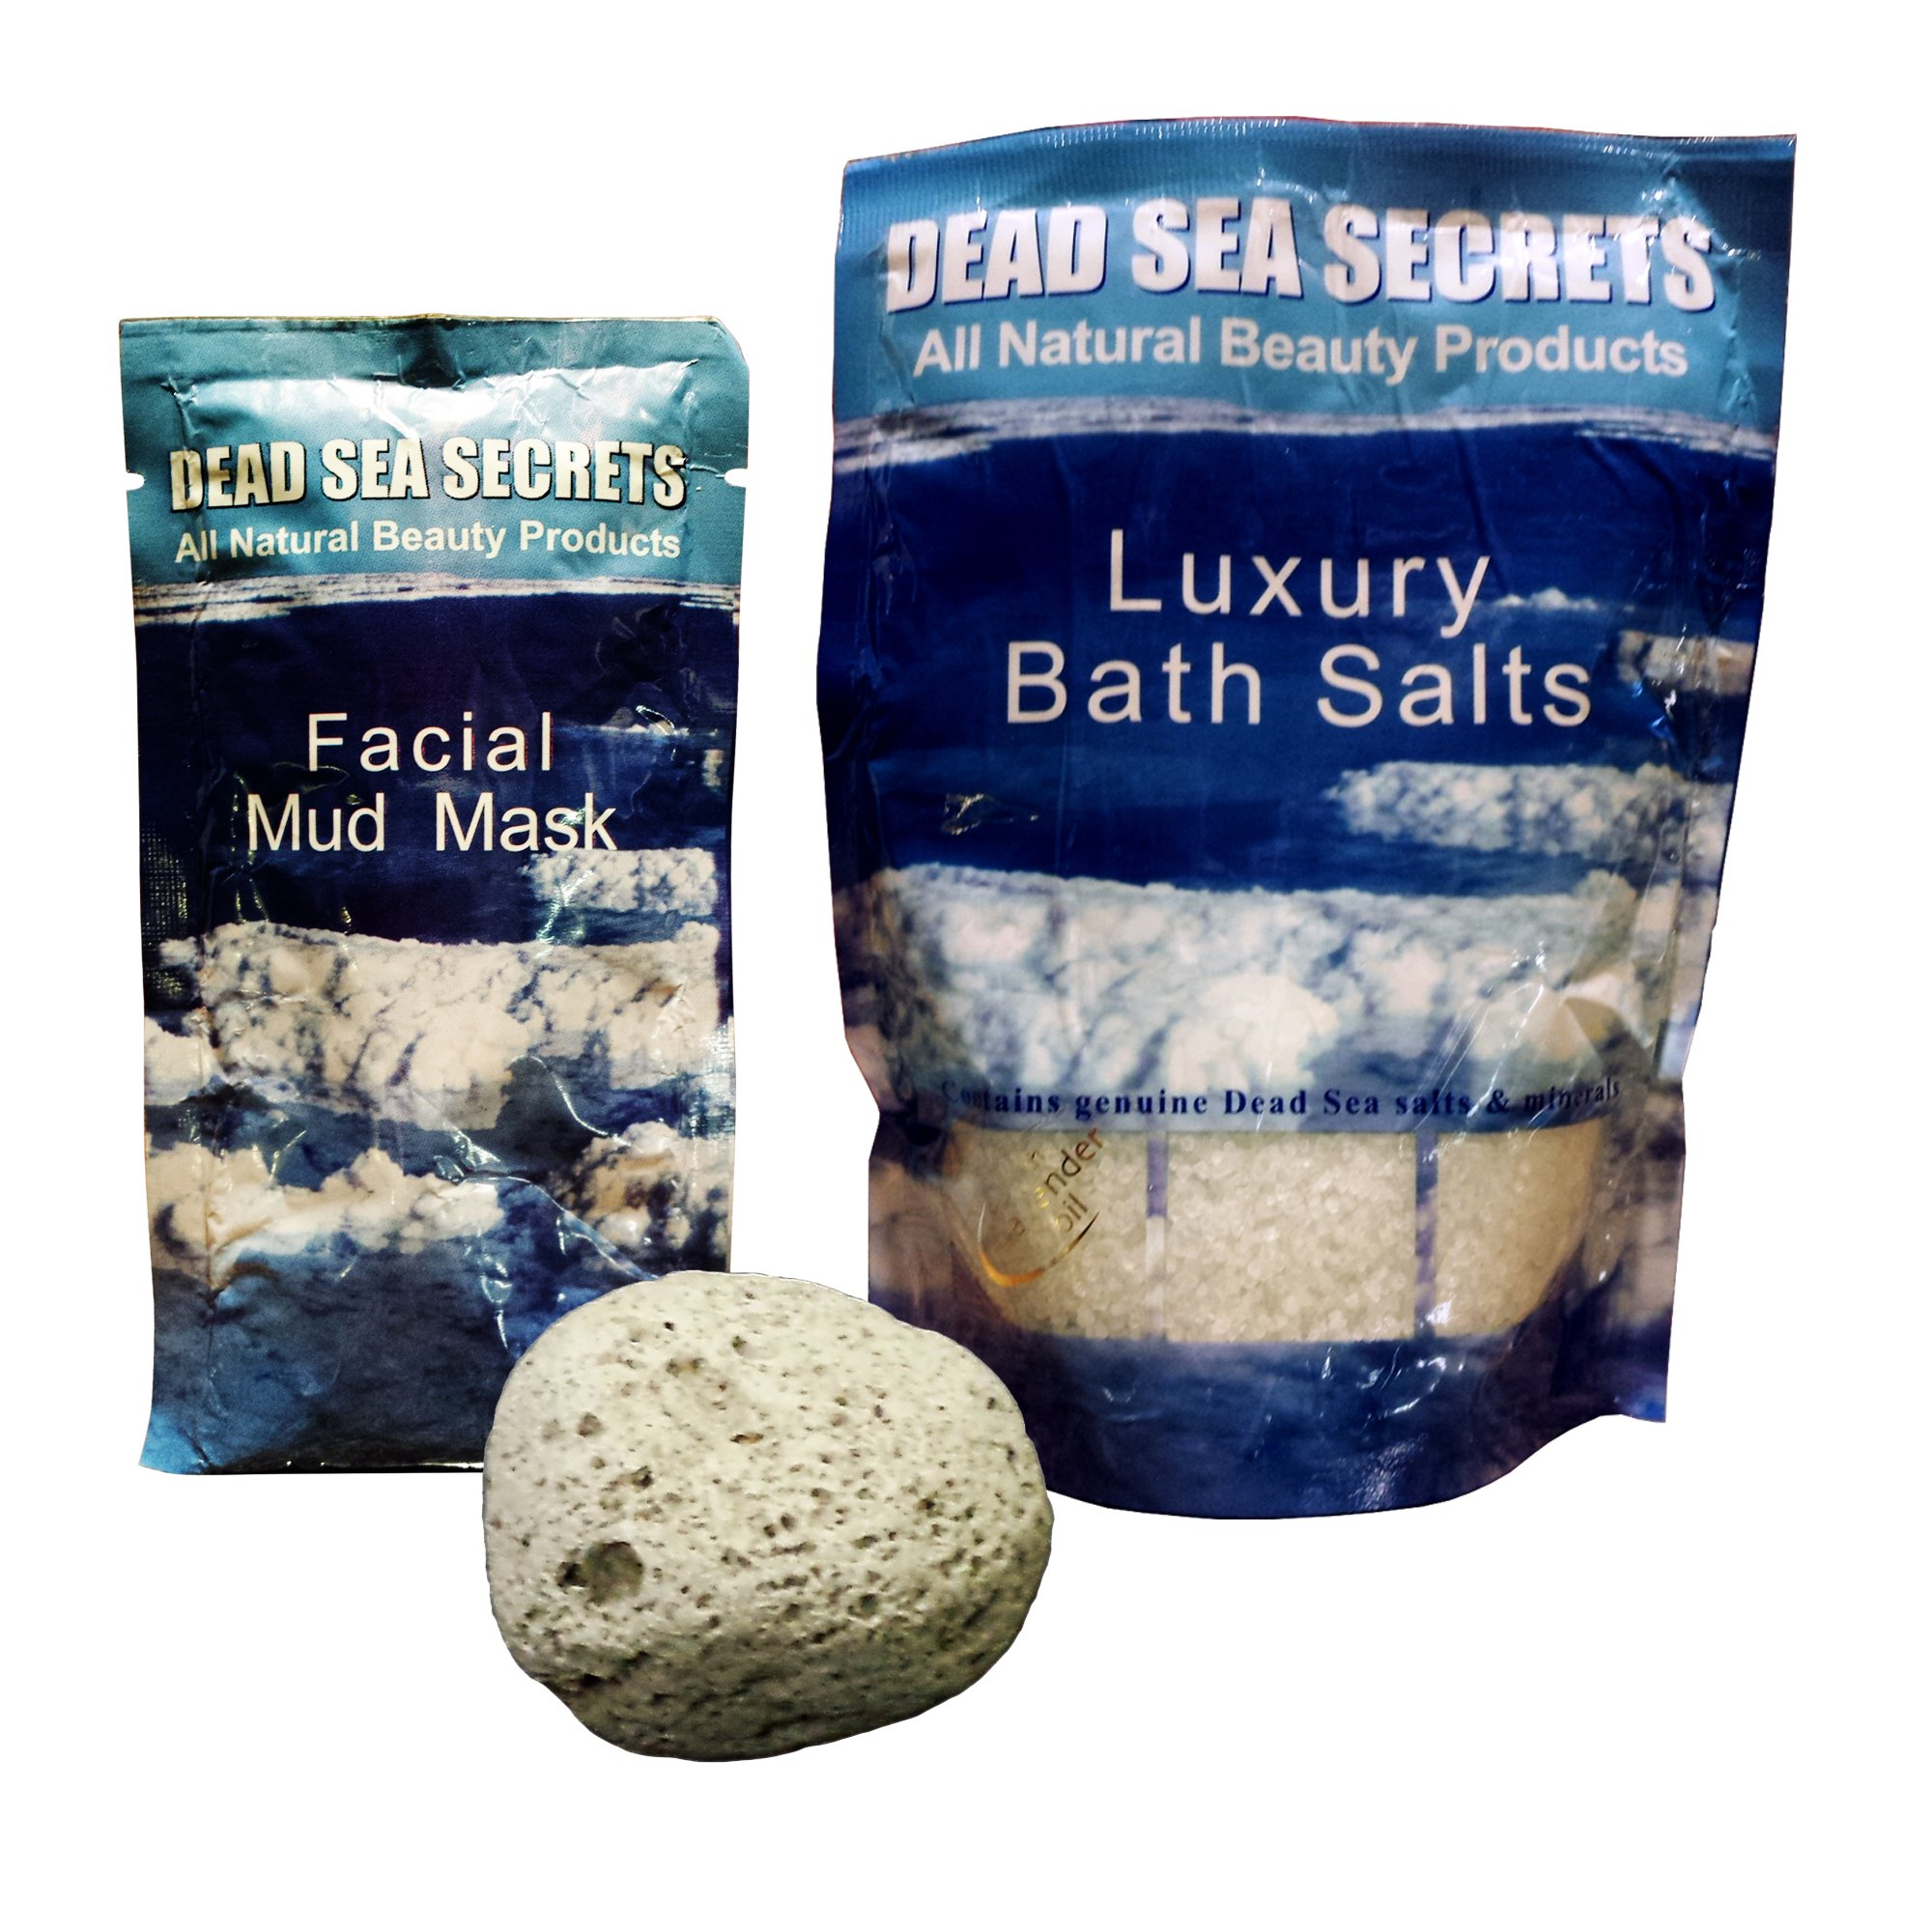 Premier Dead Sea Salt Foot Soak from Israel, Plus All Natural Volcanic Pumice Stone, Plus Special Bonus Dead Sea Mud Mask, Amazing Relaxing Foot Spa, Healing Foot Scrubber, Mask Foot Peel by DEAD SEA SECRETS